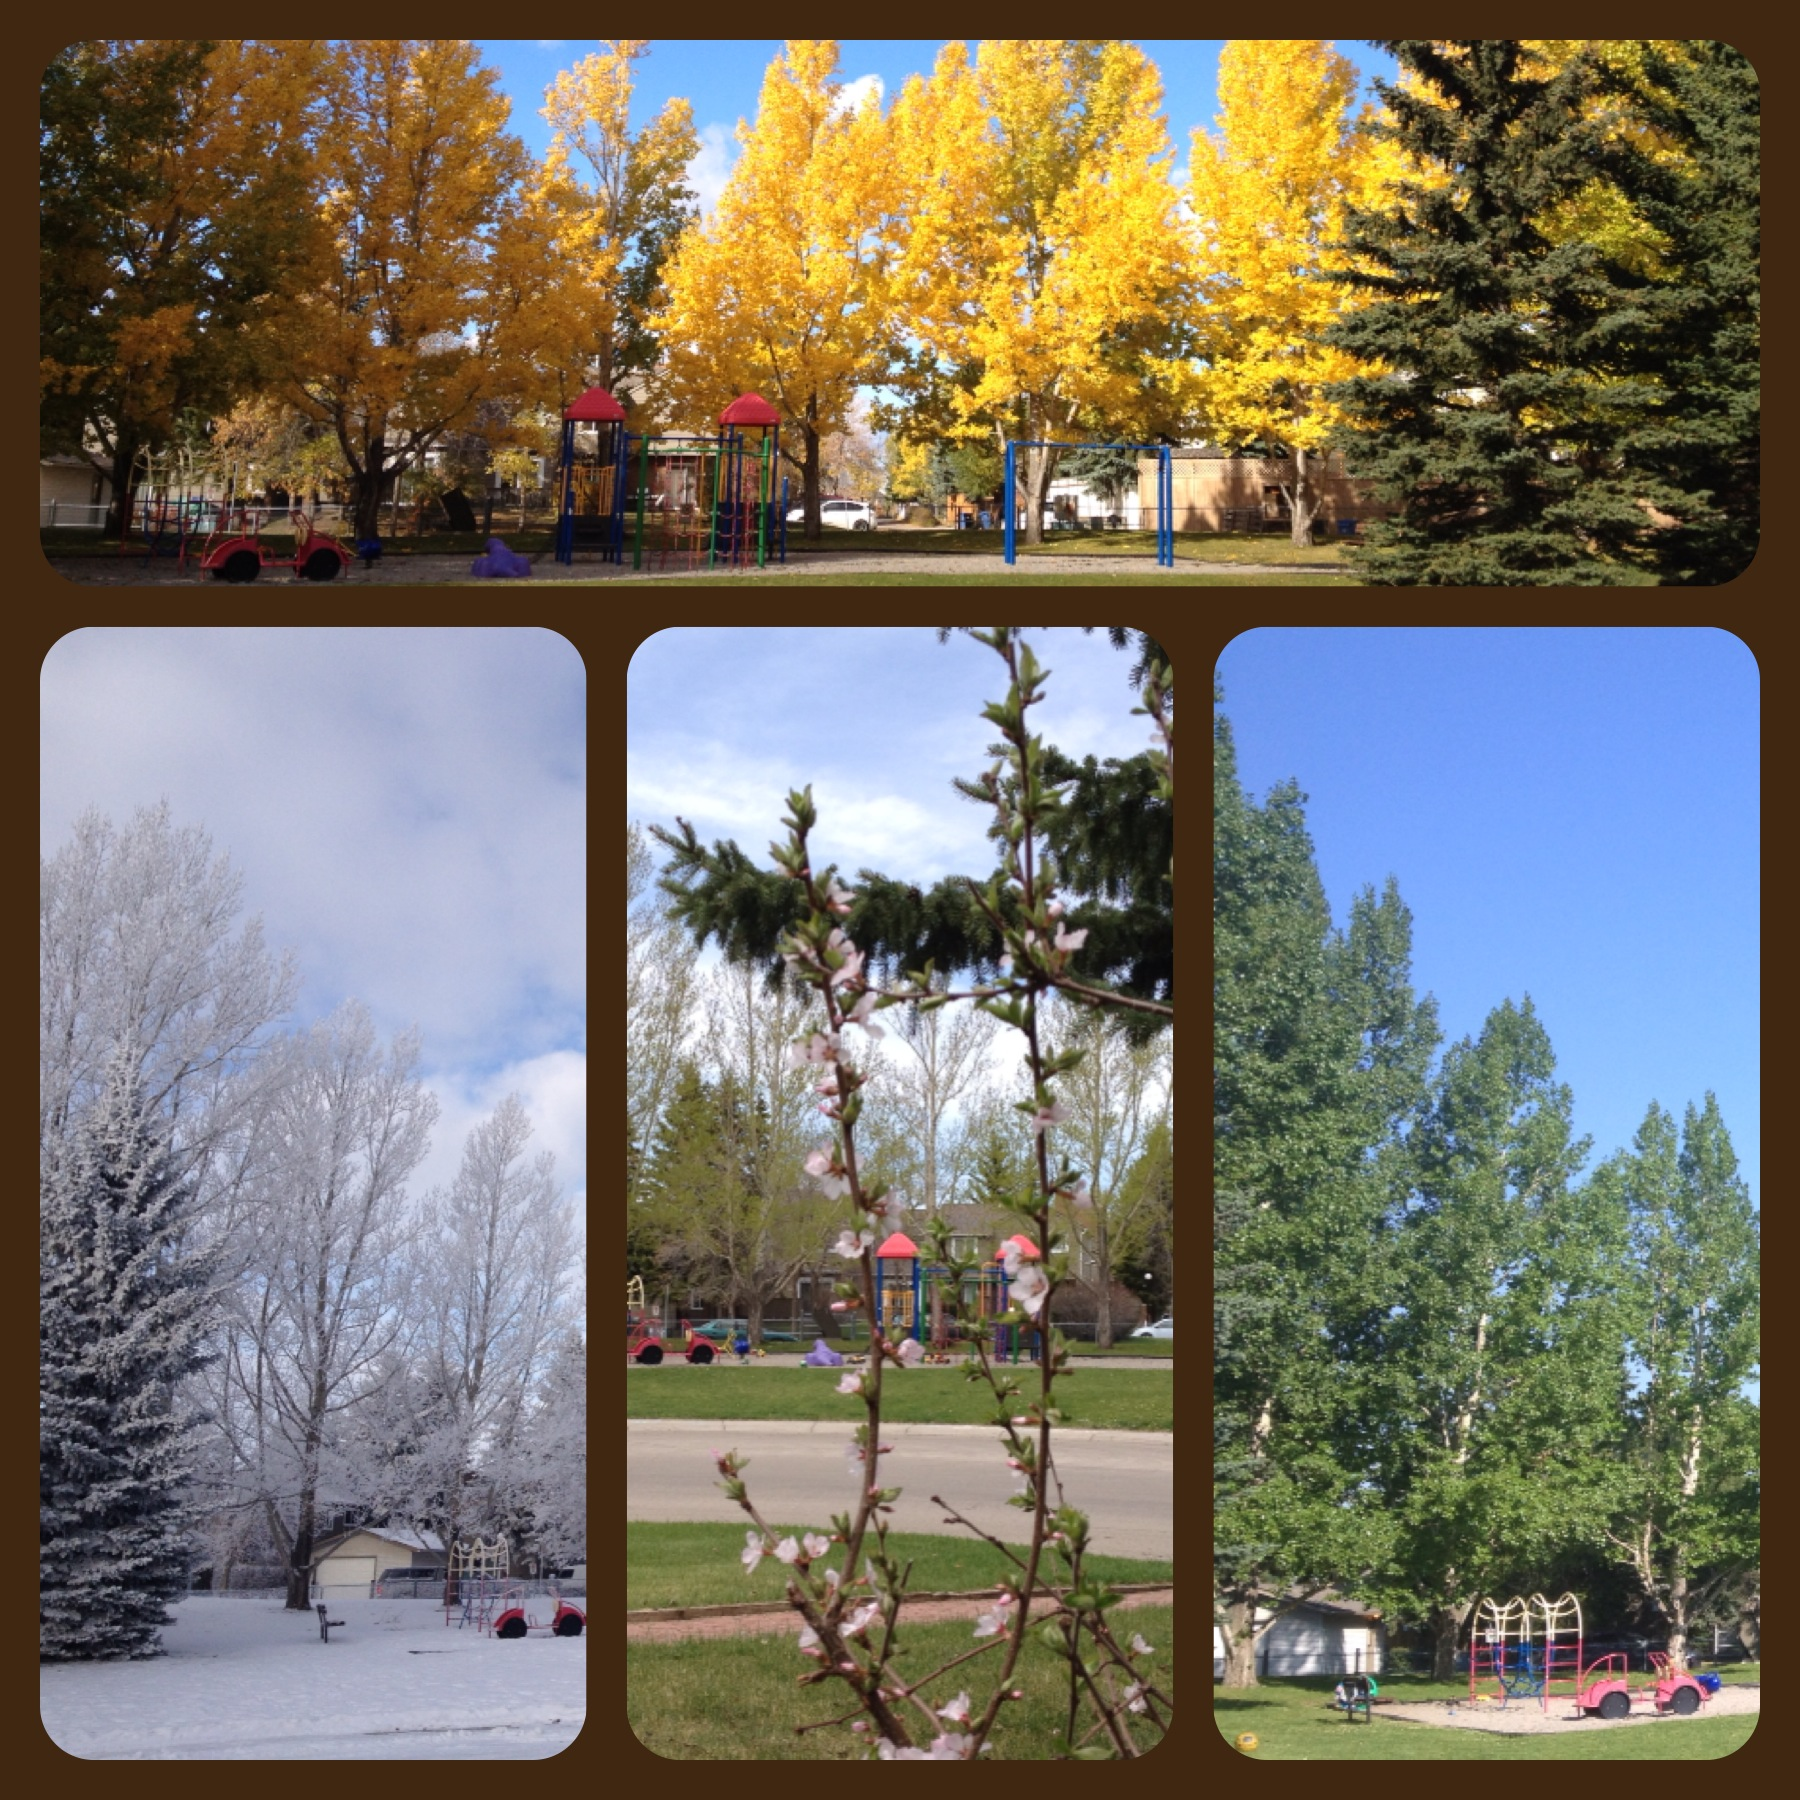 The-Four-Seasons-Calgary-2013-2014.jpg